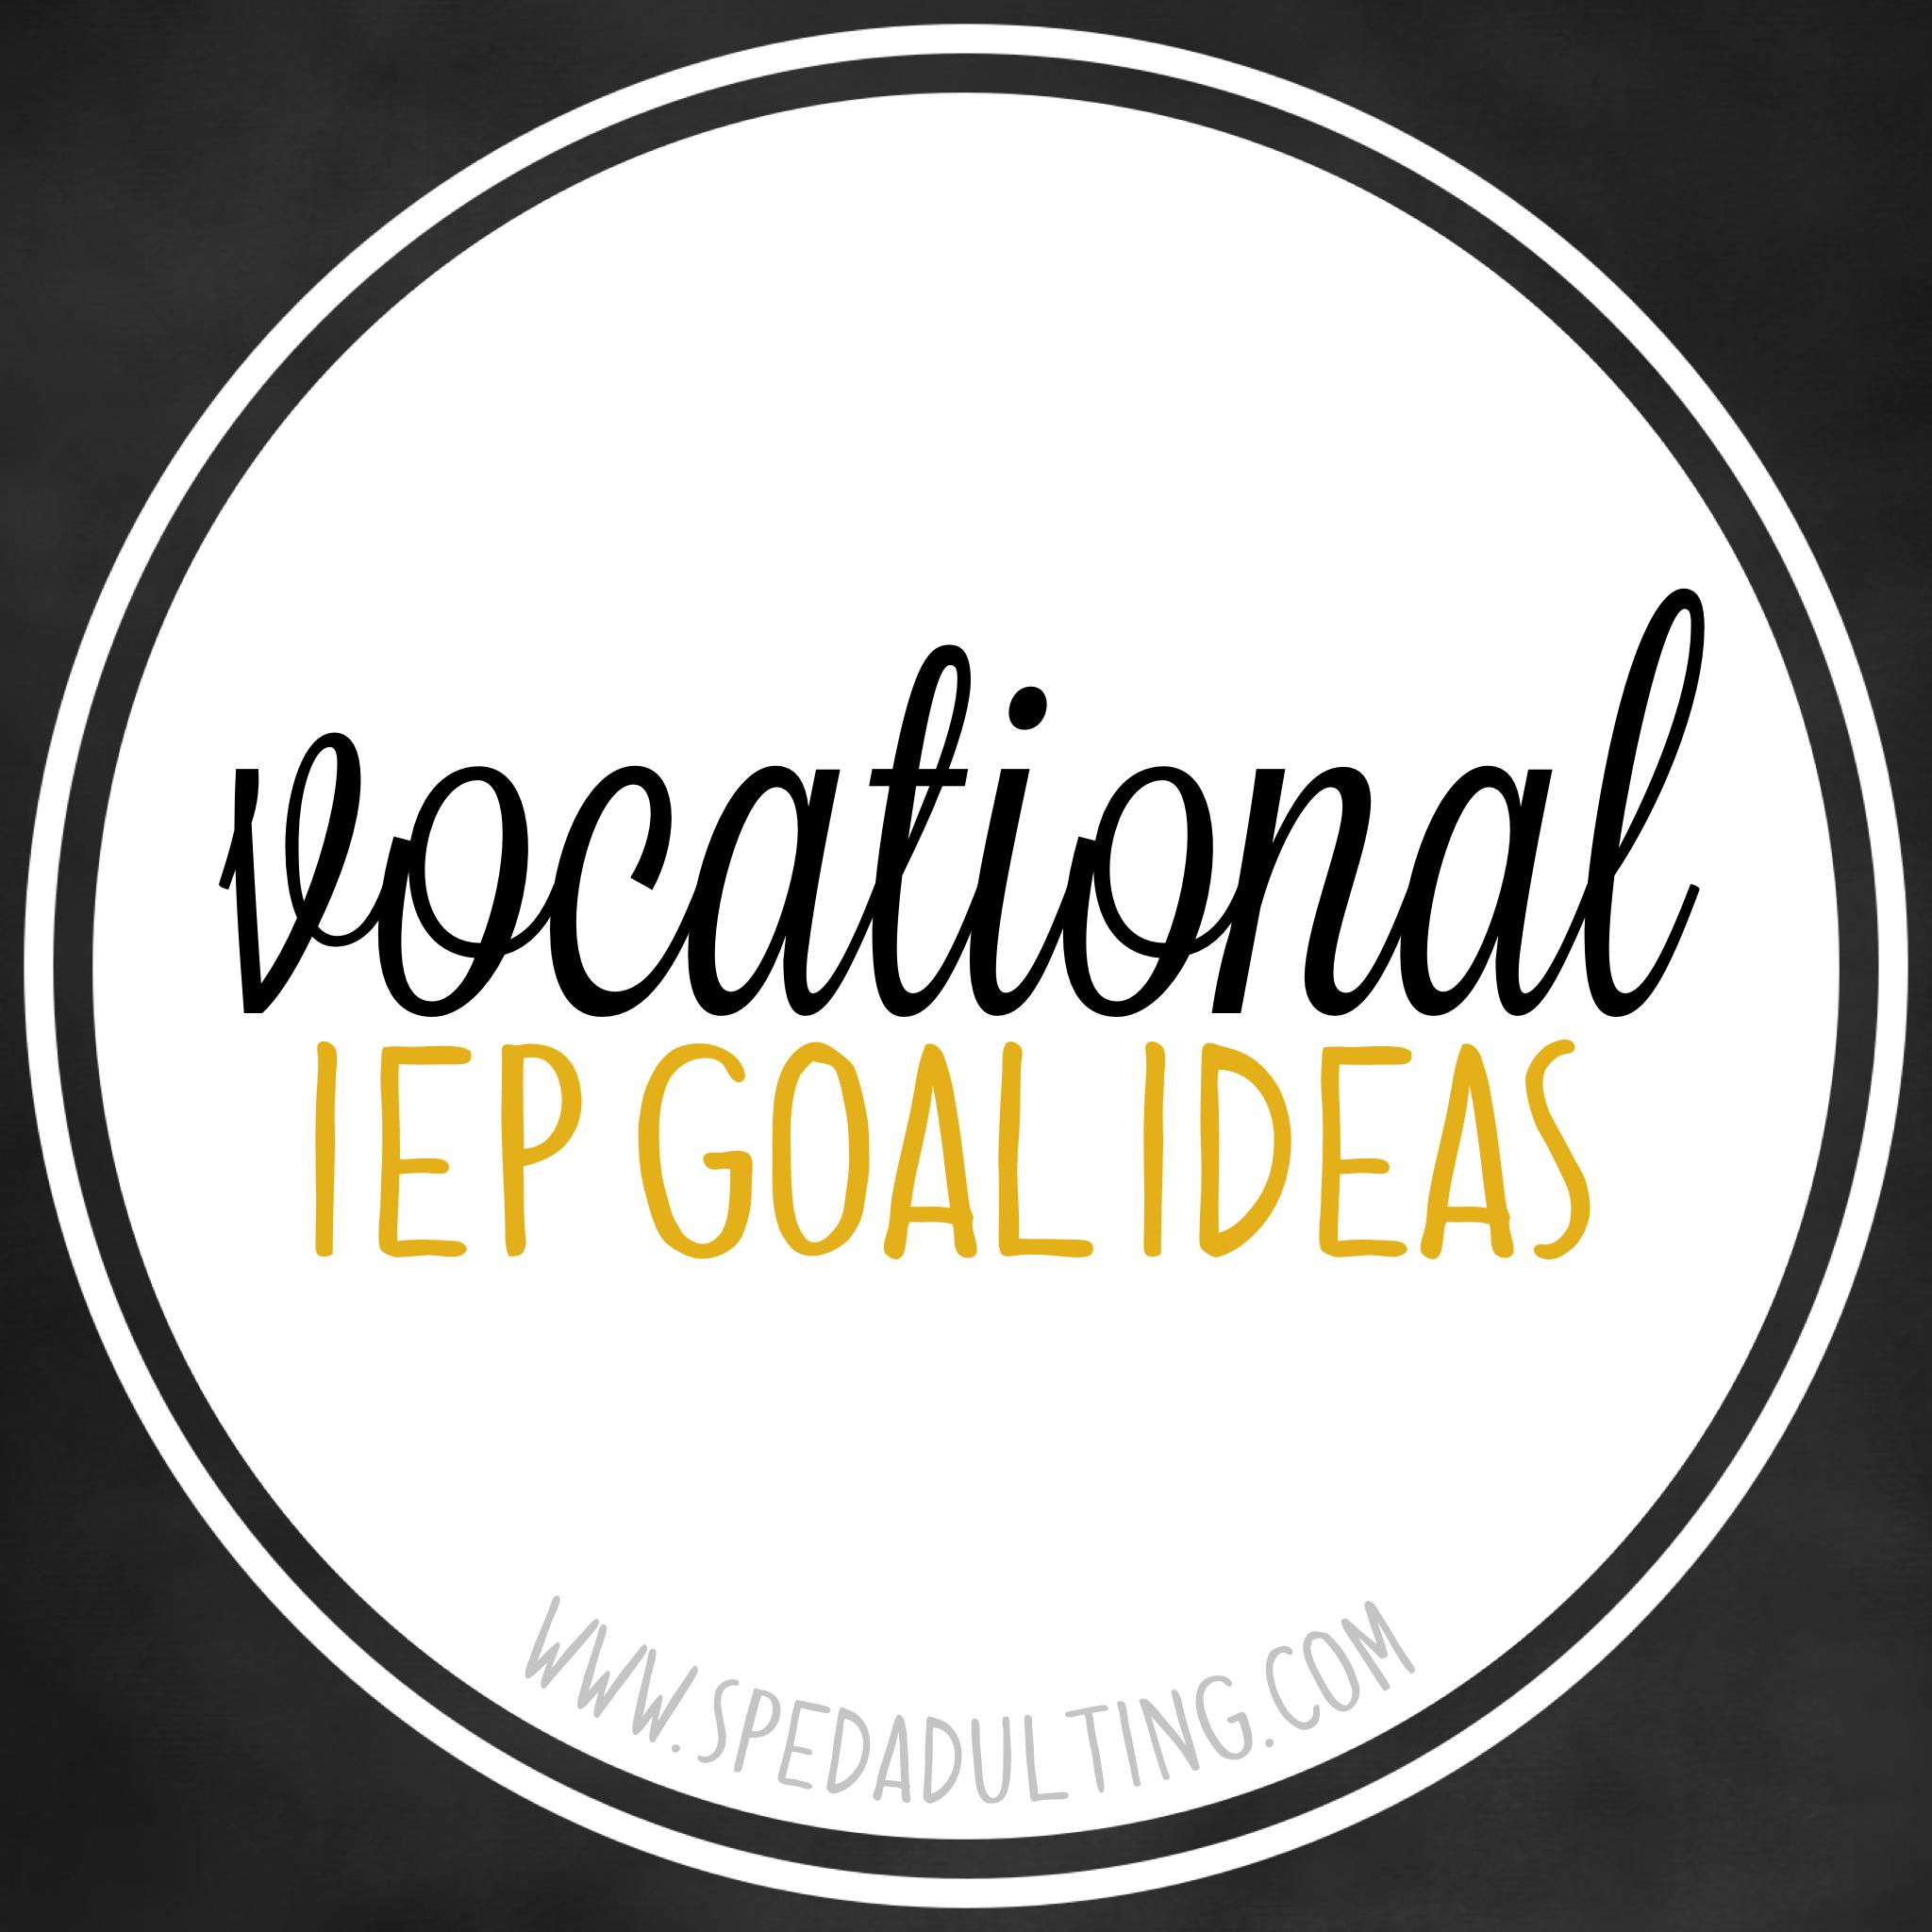 Iep Goal Ideas Vocational